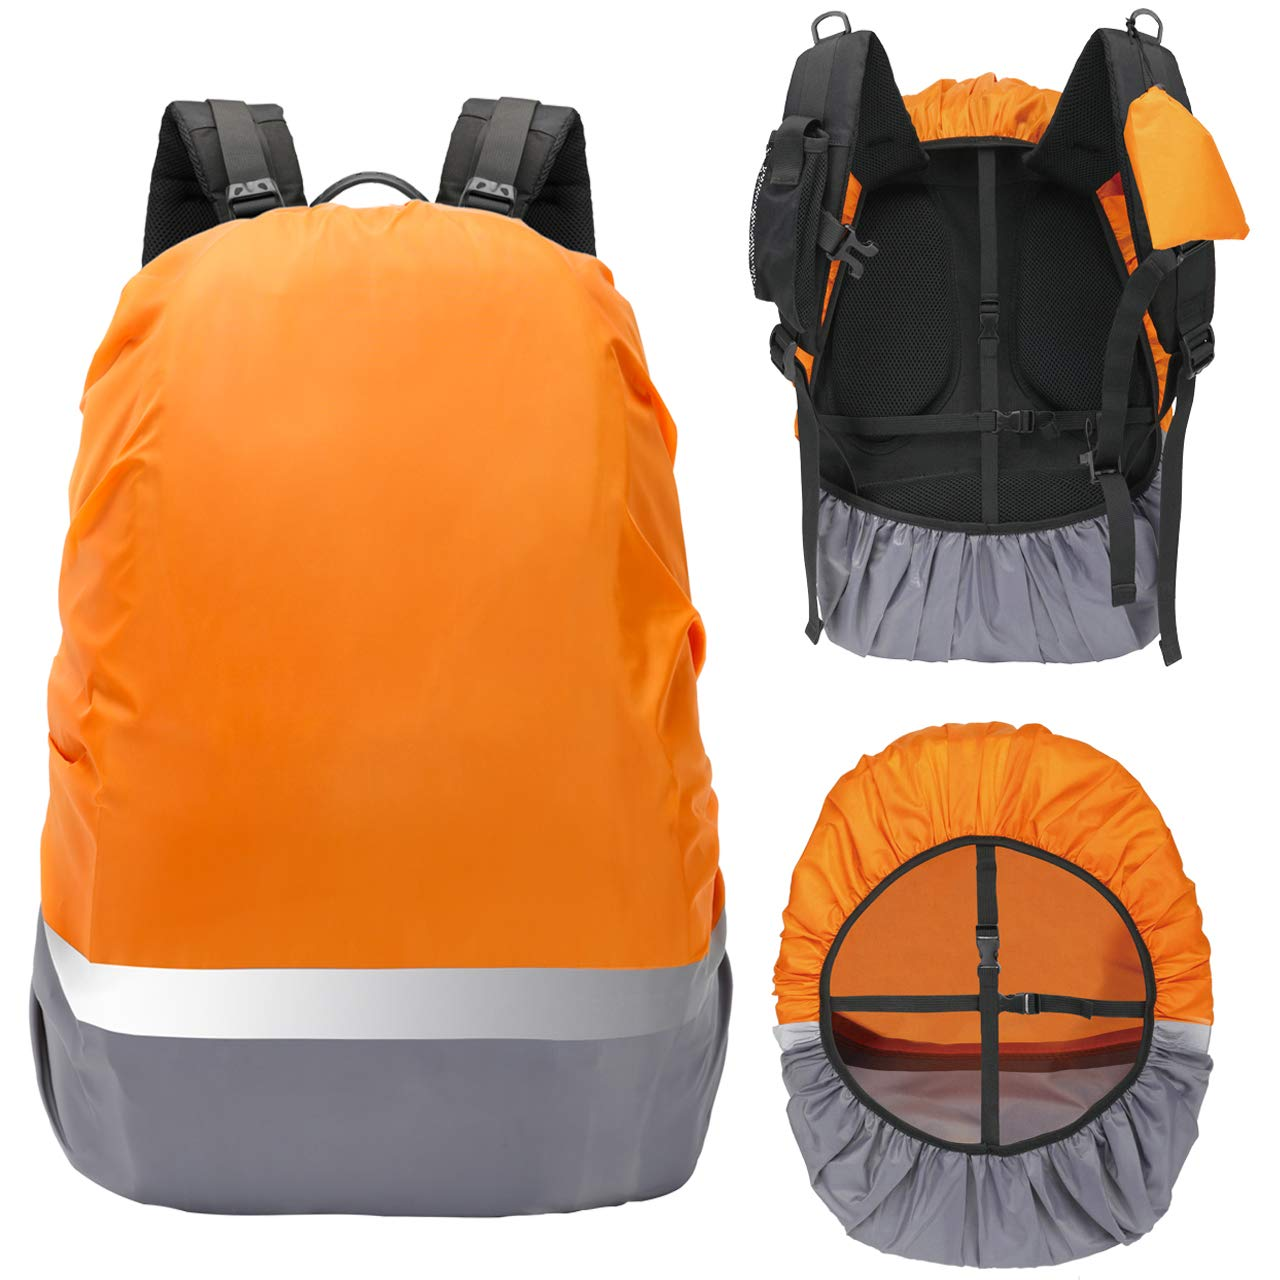 CANAMI バックパック レインカバー 防水 バックパックカバー 反射ストラップ (30-55L) アップグレード 調節可能 滑り止めバックルストラップ+ポータブル収納パック バックパックカバー 防雨 アウトドア バイキング ハイキング キャンプ B07QKY46XW Orange+Grey with Reflective Strip M (30-40L)